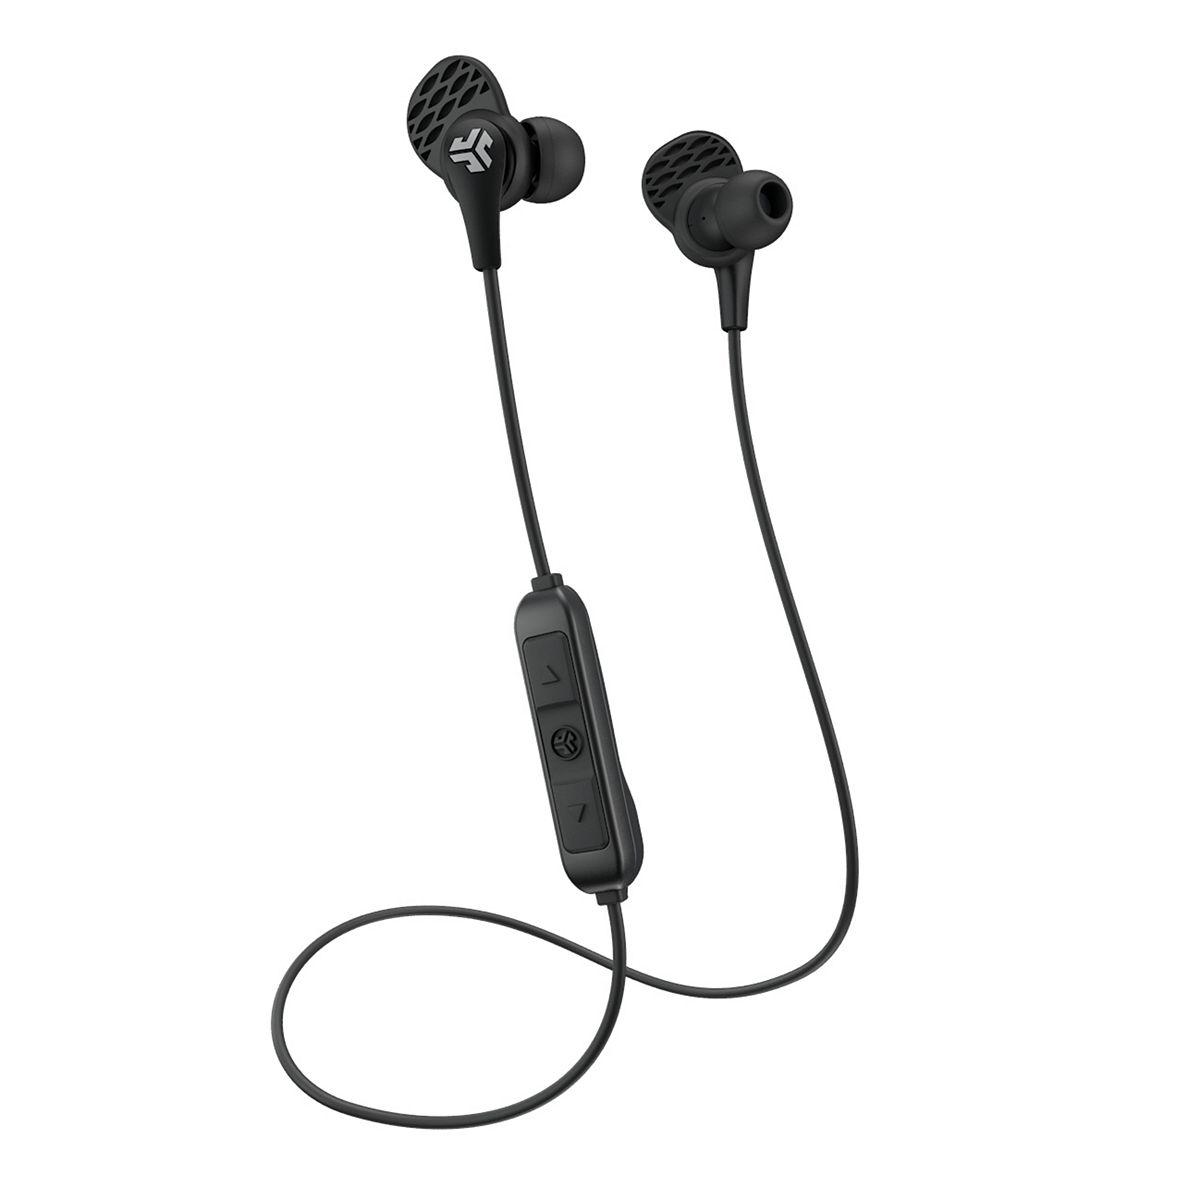 JBuds Pro Bluetooth Wireless Earbuds